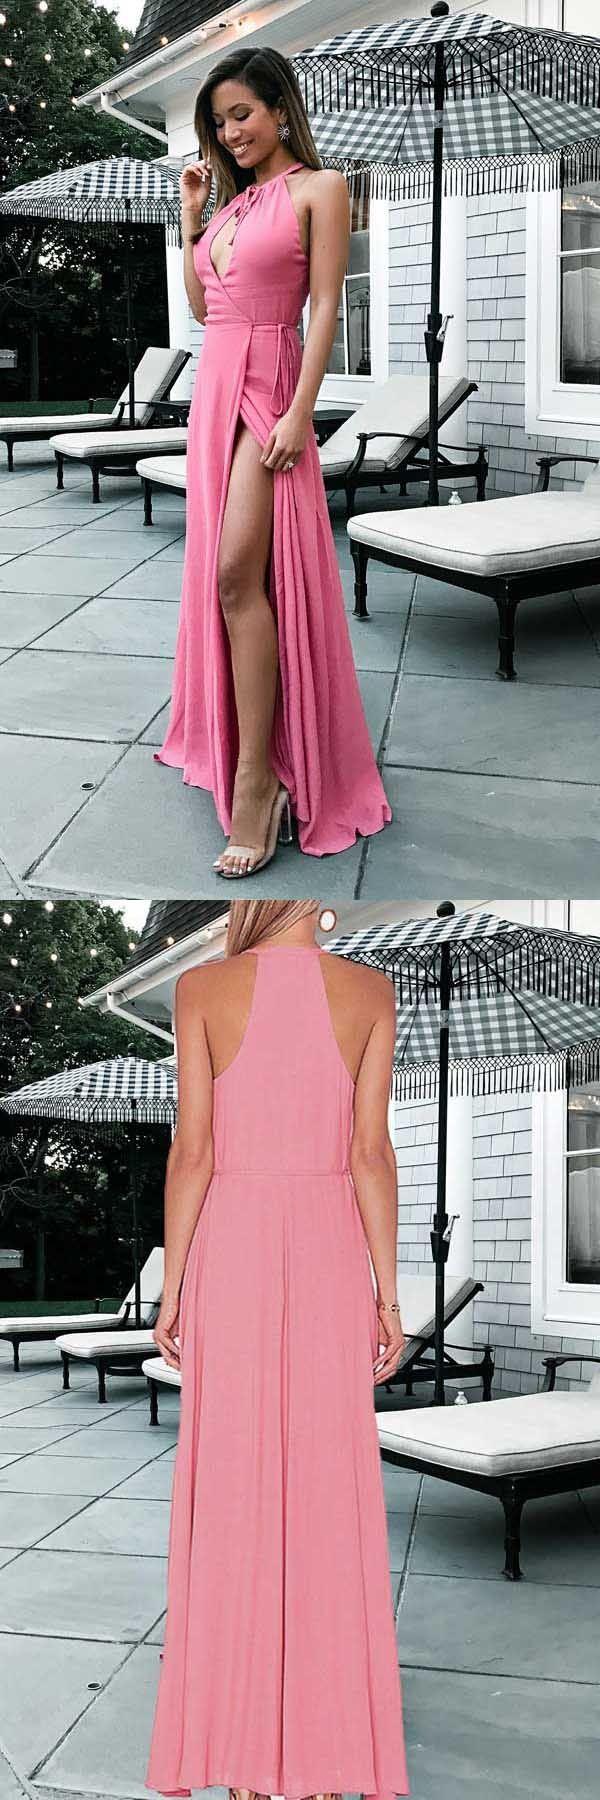 prom dresses longpromdresses prom dresses on sale prom